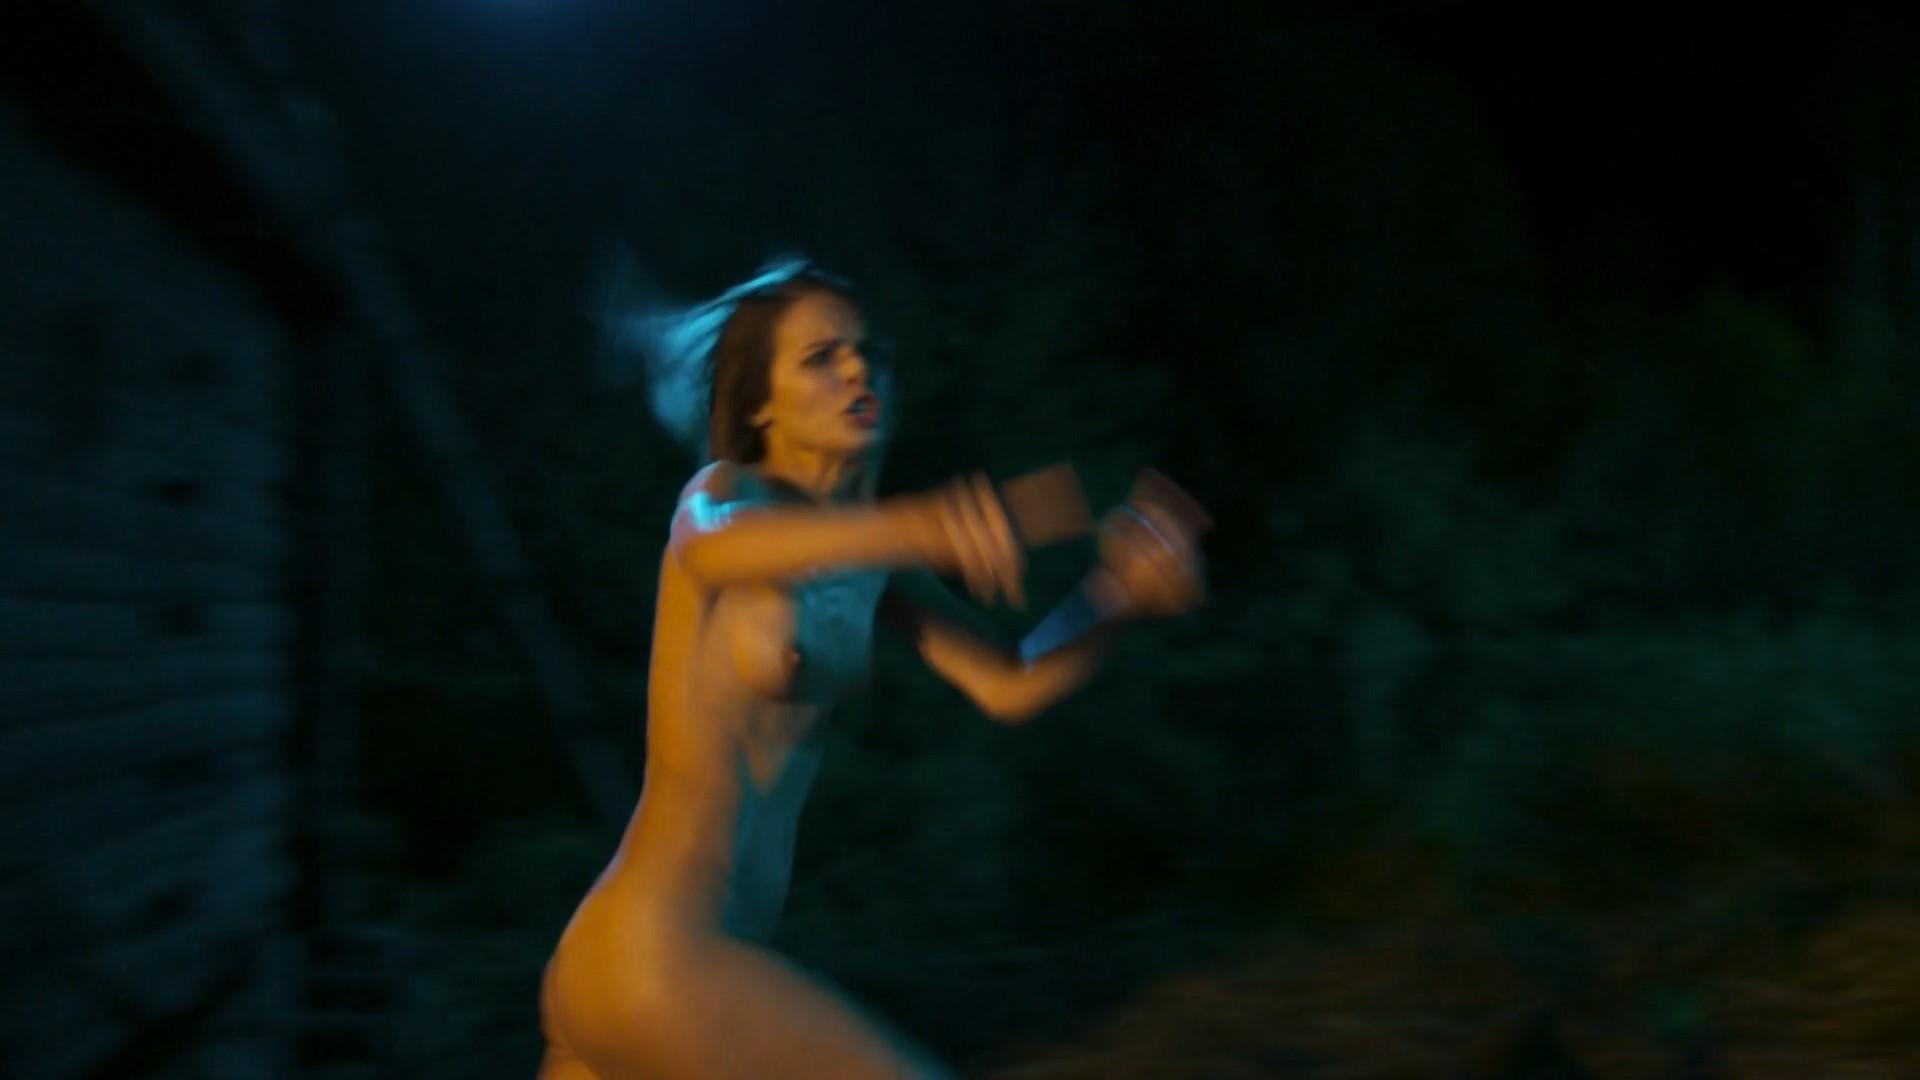 Lyubov aksyonova nude naked (97 image)